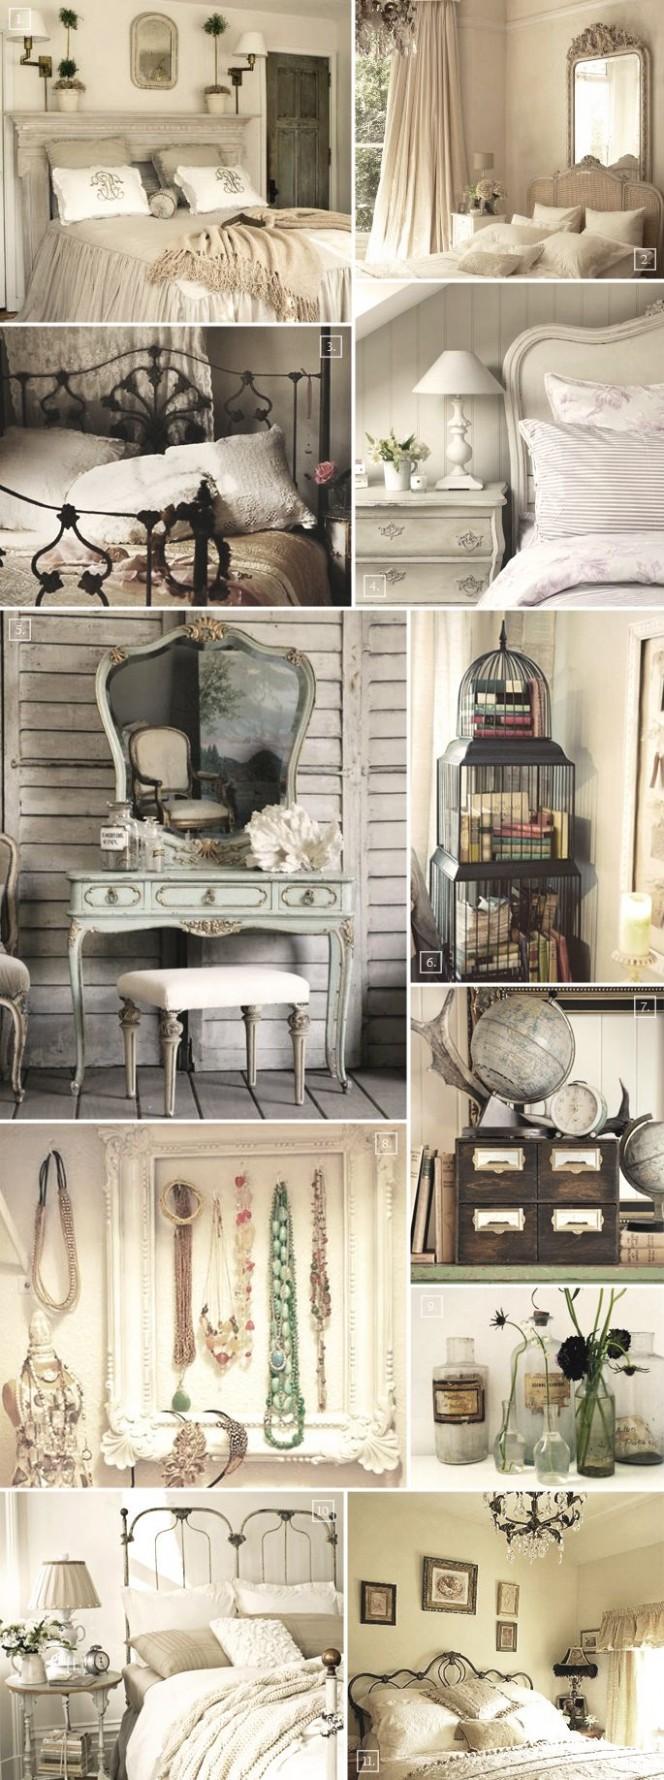 Vintage Bedroom Decor Accessories and Ideas - Home Tree Atlas  - Bedroom Ideas Vintage